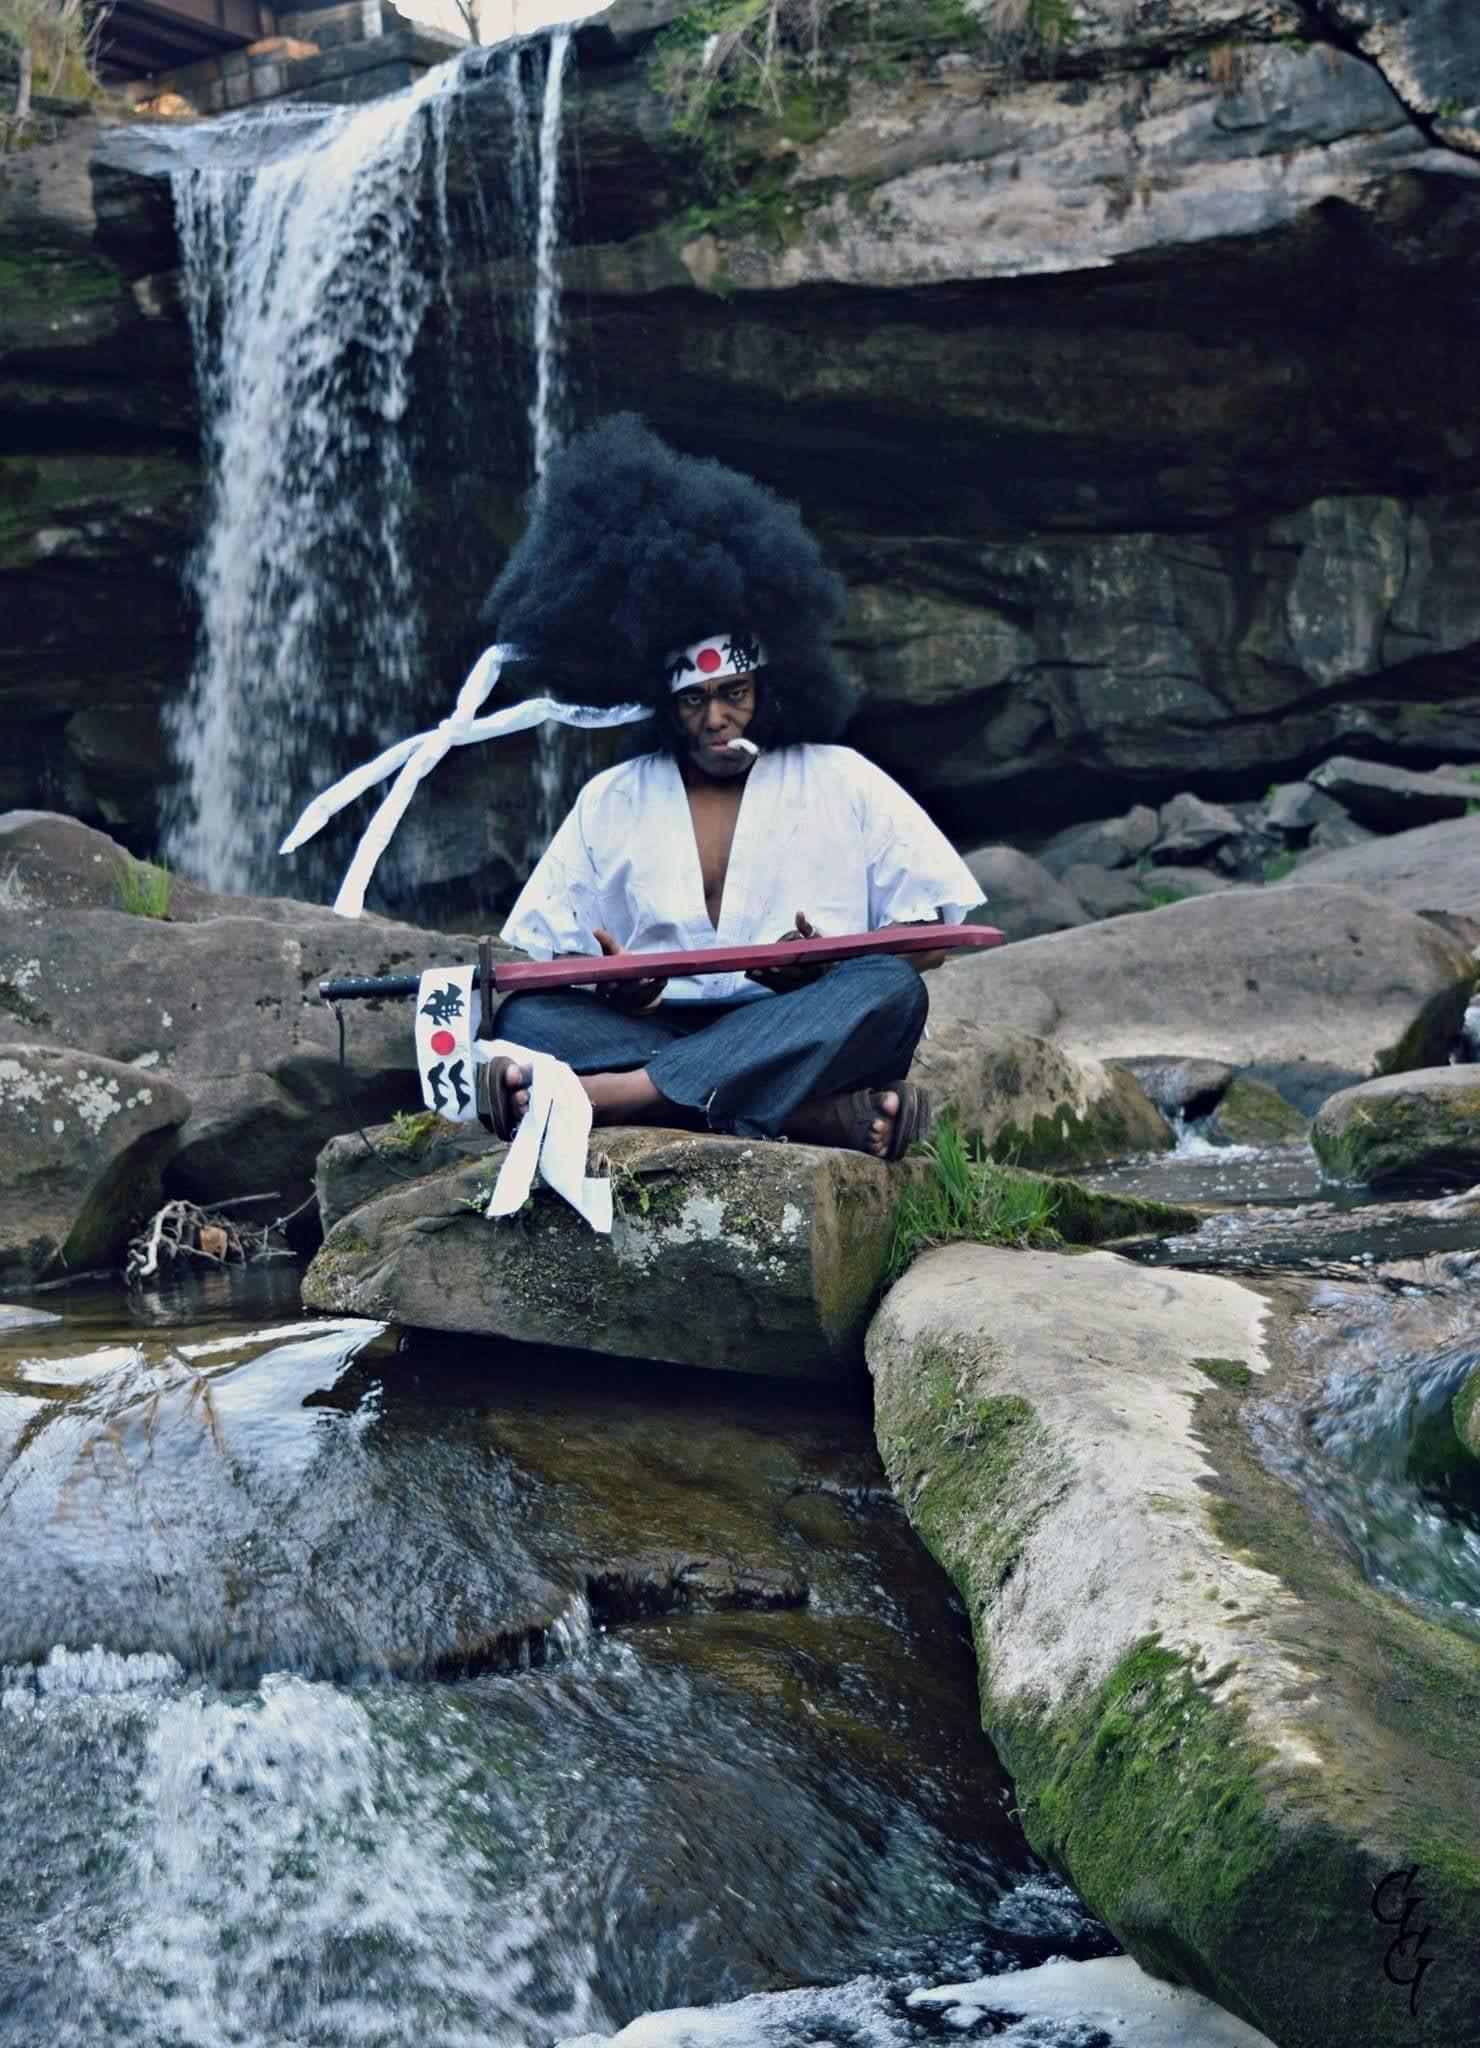 The World Needs More Afro Samurai Cosplay